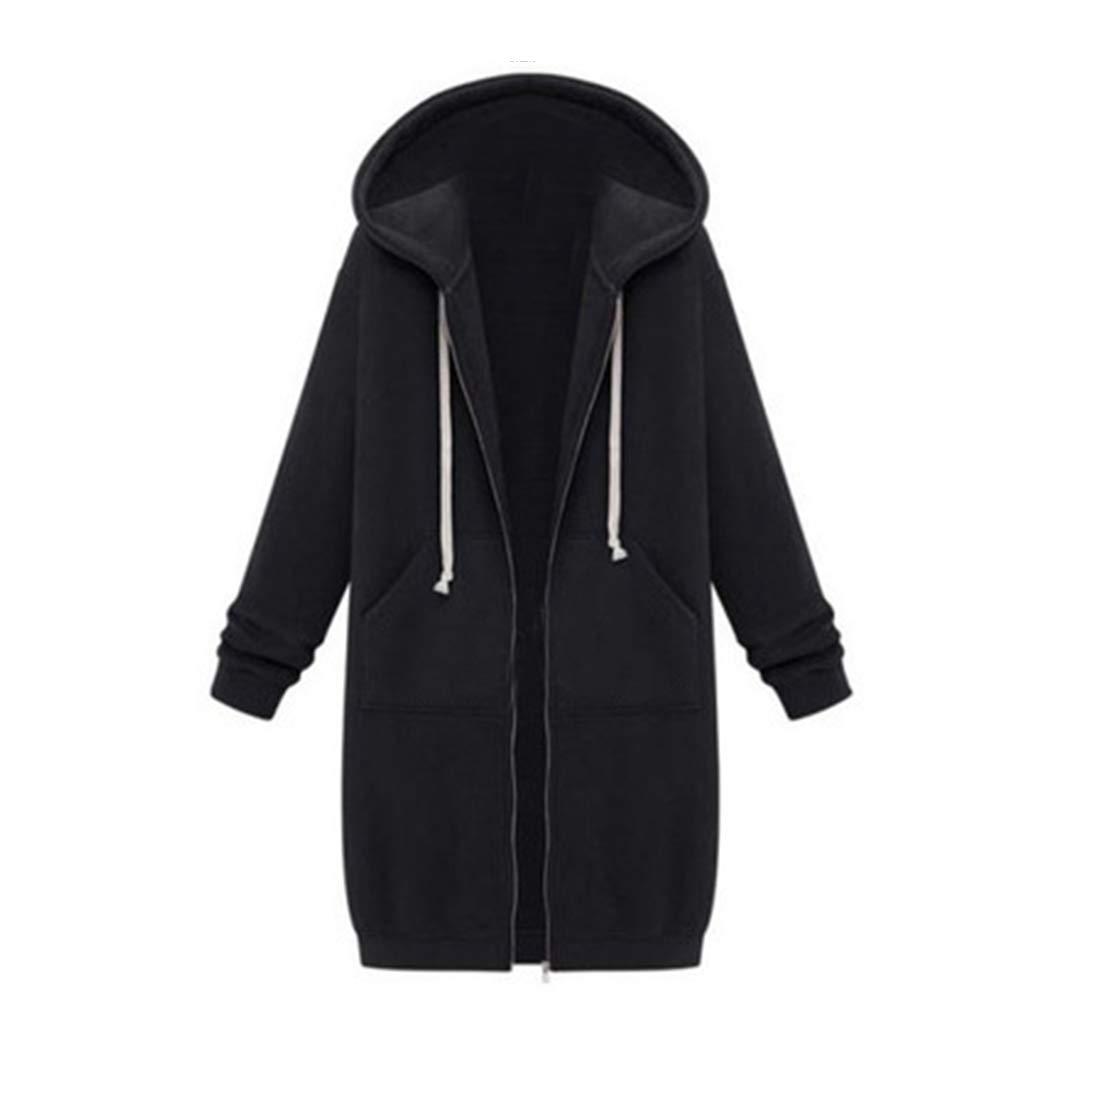 Longline Velvet Zipped Sweater Coat Zhhlinyuan Ladies Loose Hoodie Sweatshirts